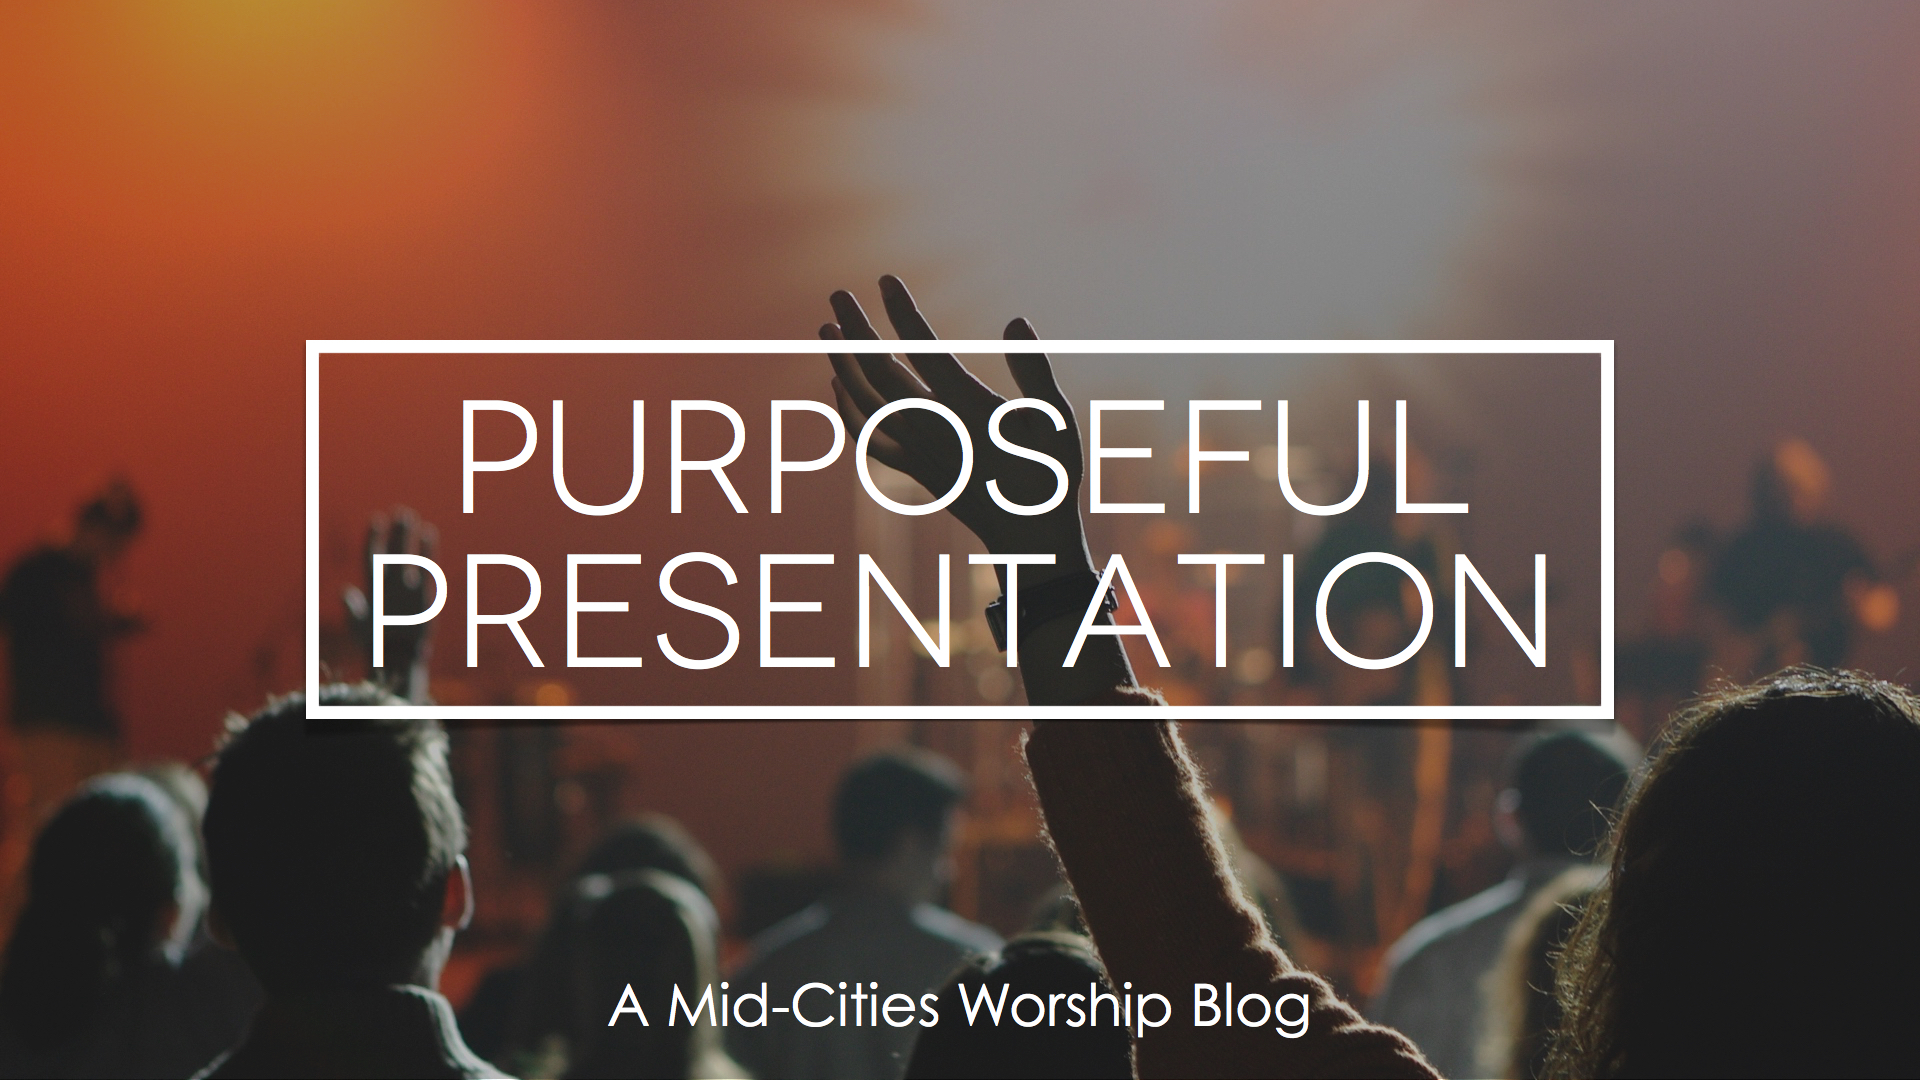 Purposeful Presentation